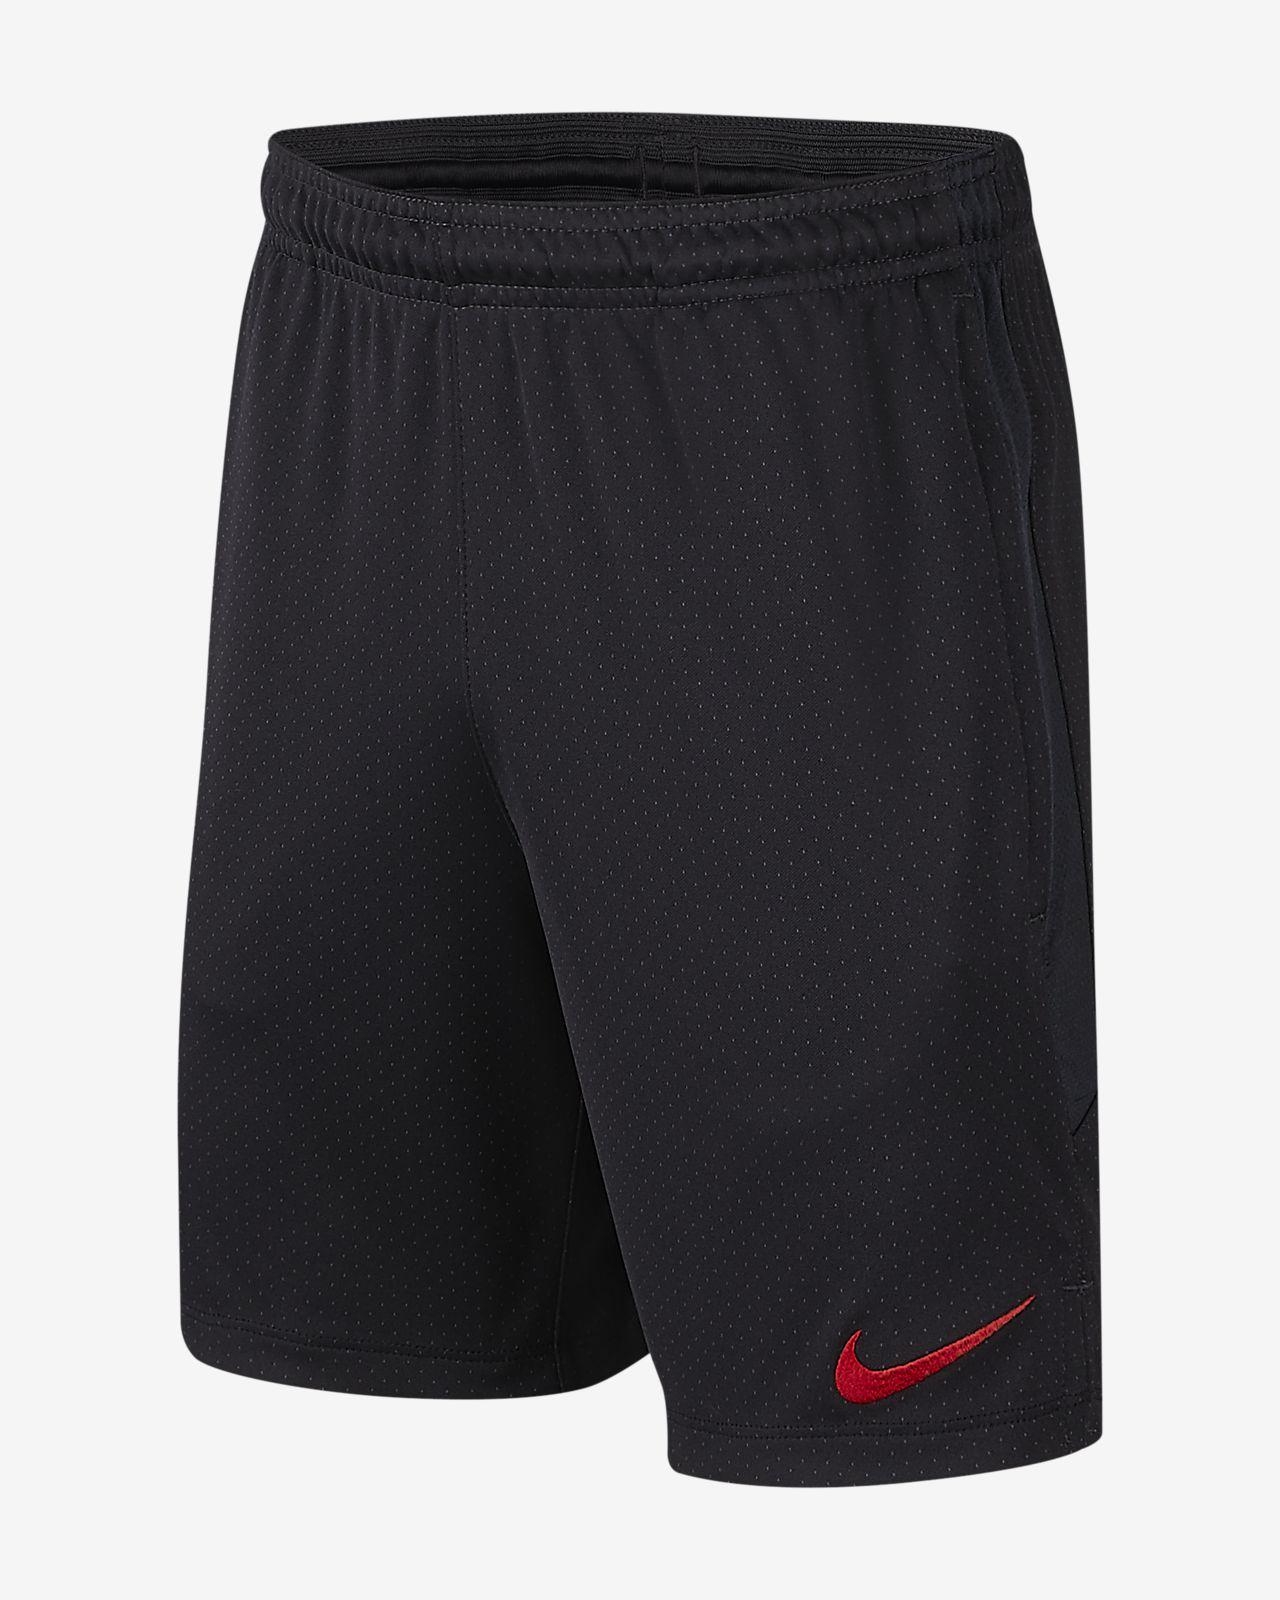 Nike Dri-FIT Paris Saint-Germain Strike Pantalons curts de futbol - Nen/a